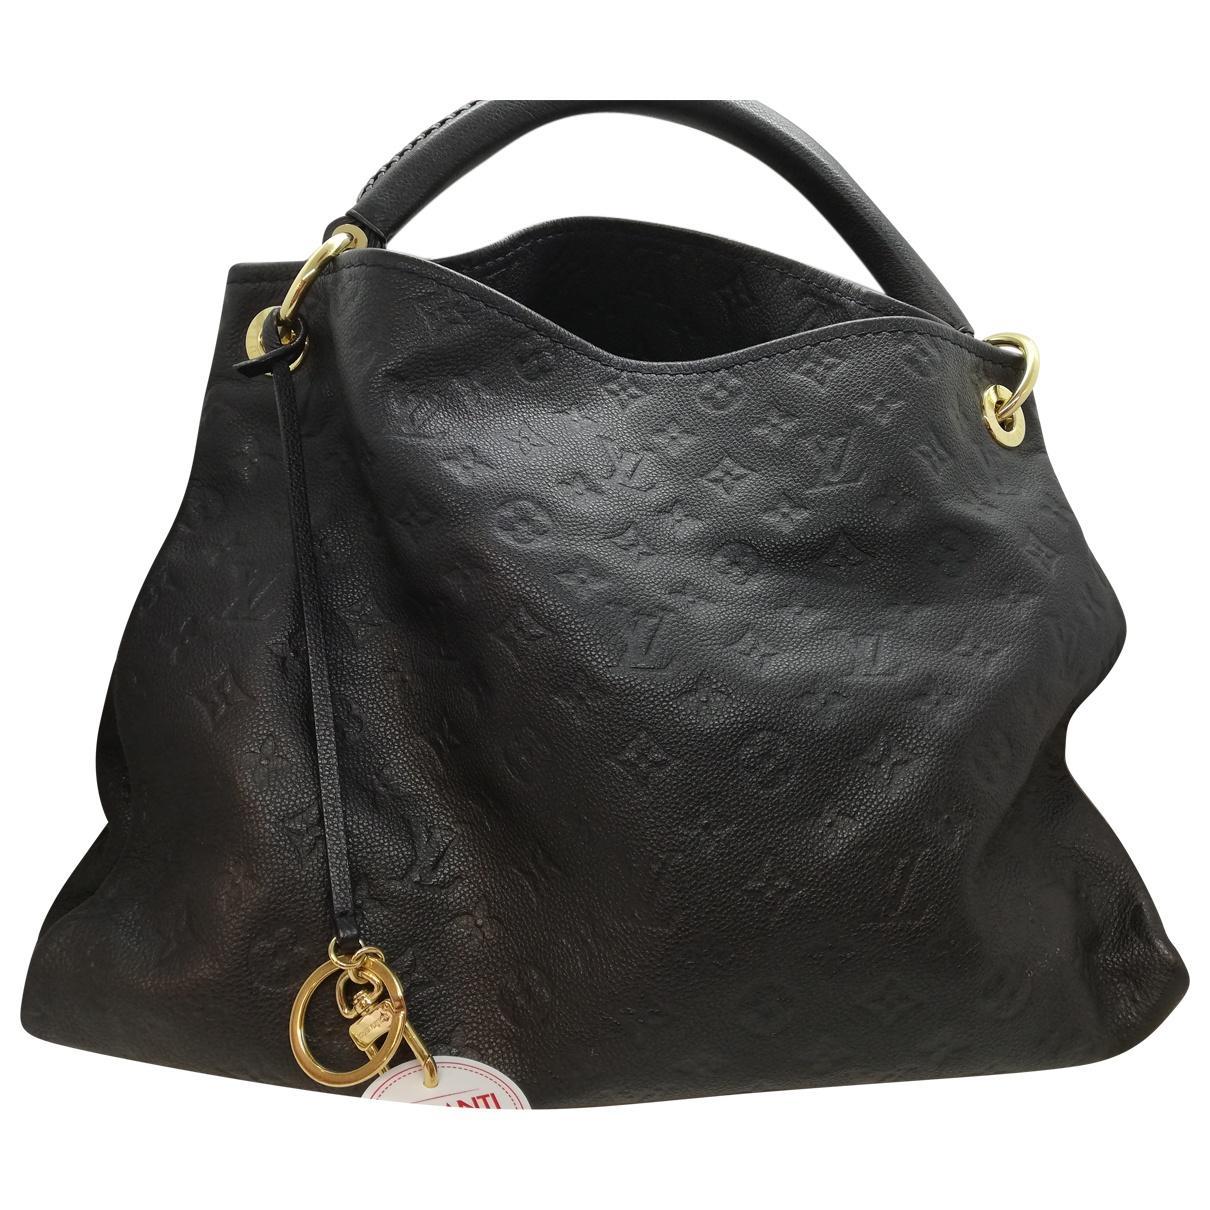 145fcb55d599 Lyst - Louis Vuitton Pre-owned Artsy Leather Handbag in Black